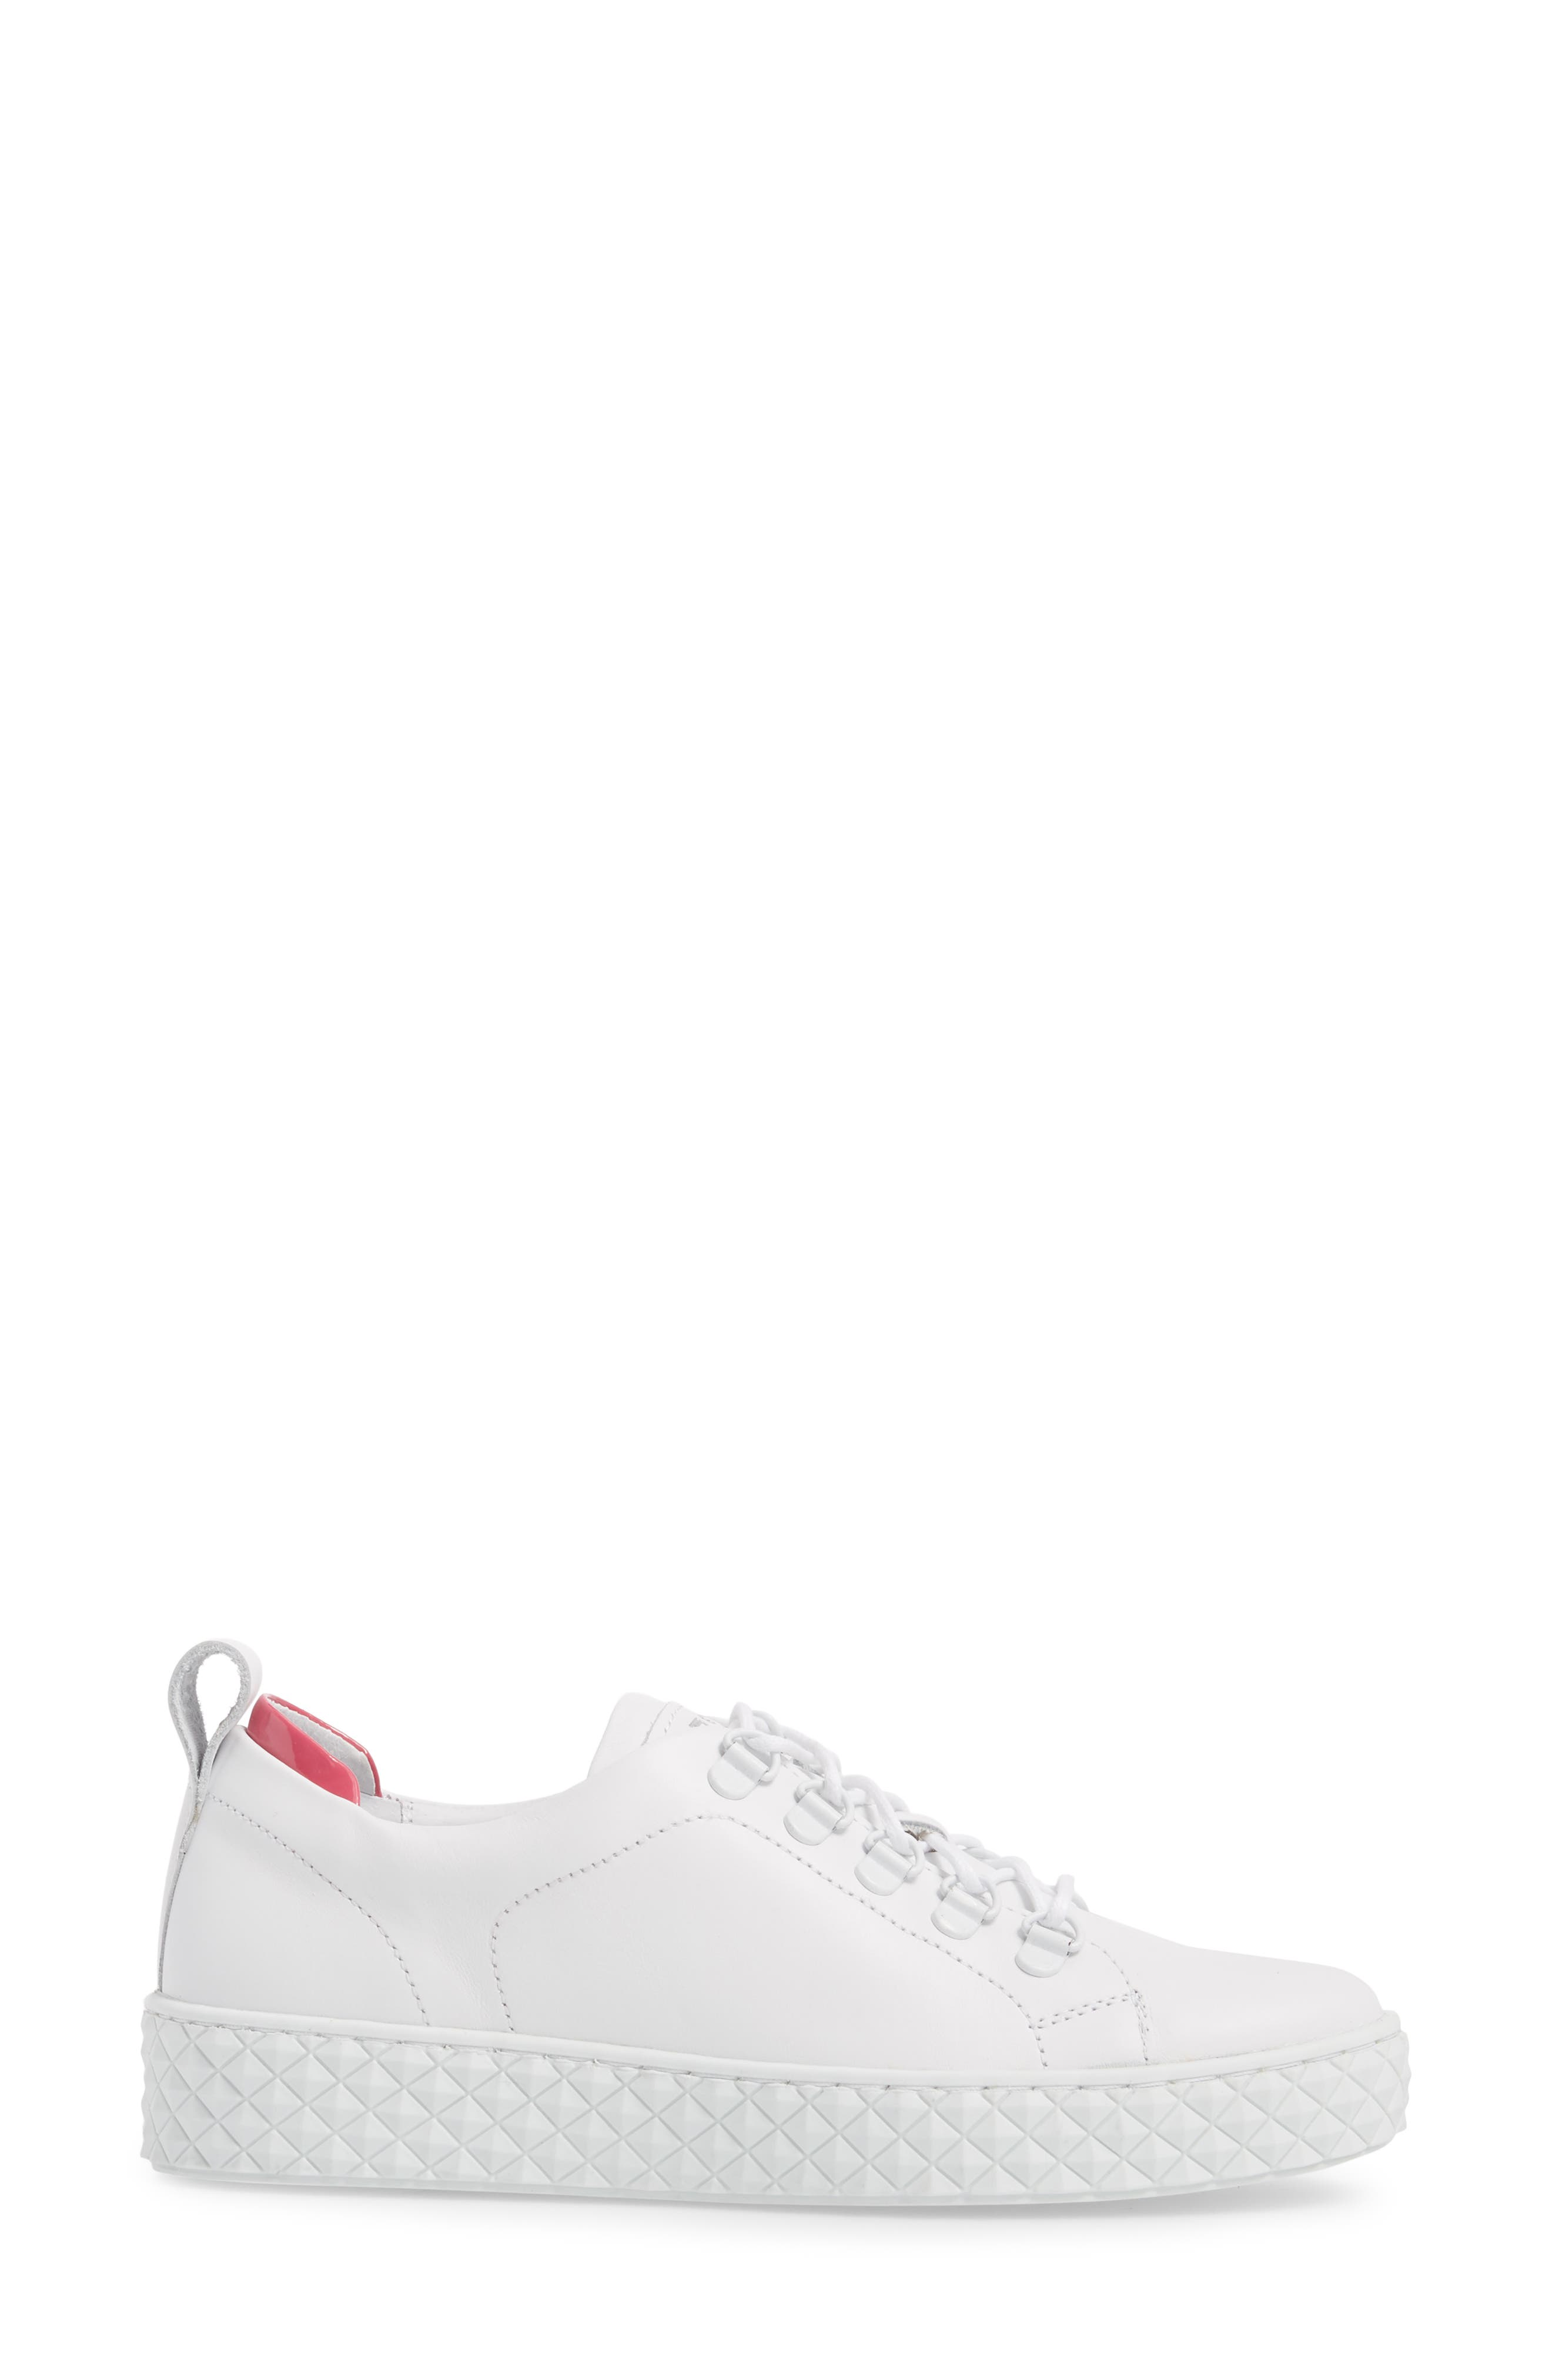 Sol Sneaker,                             Alternate thumbnail 3, color,